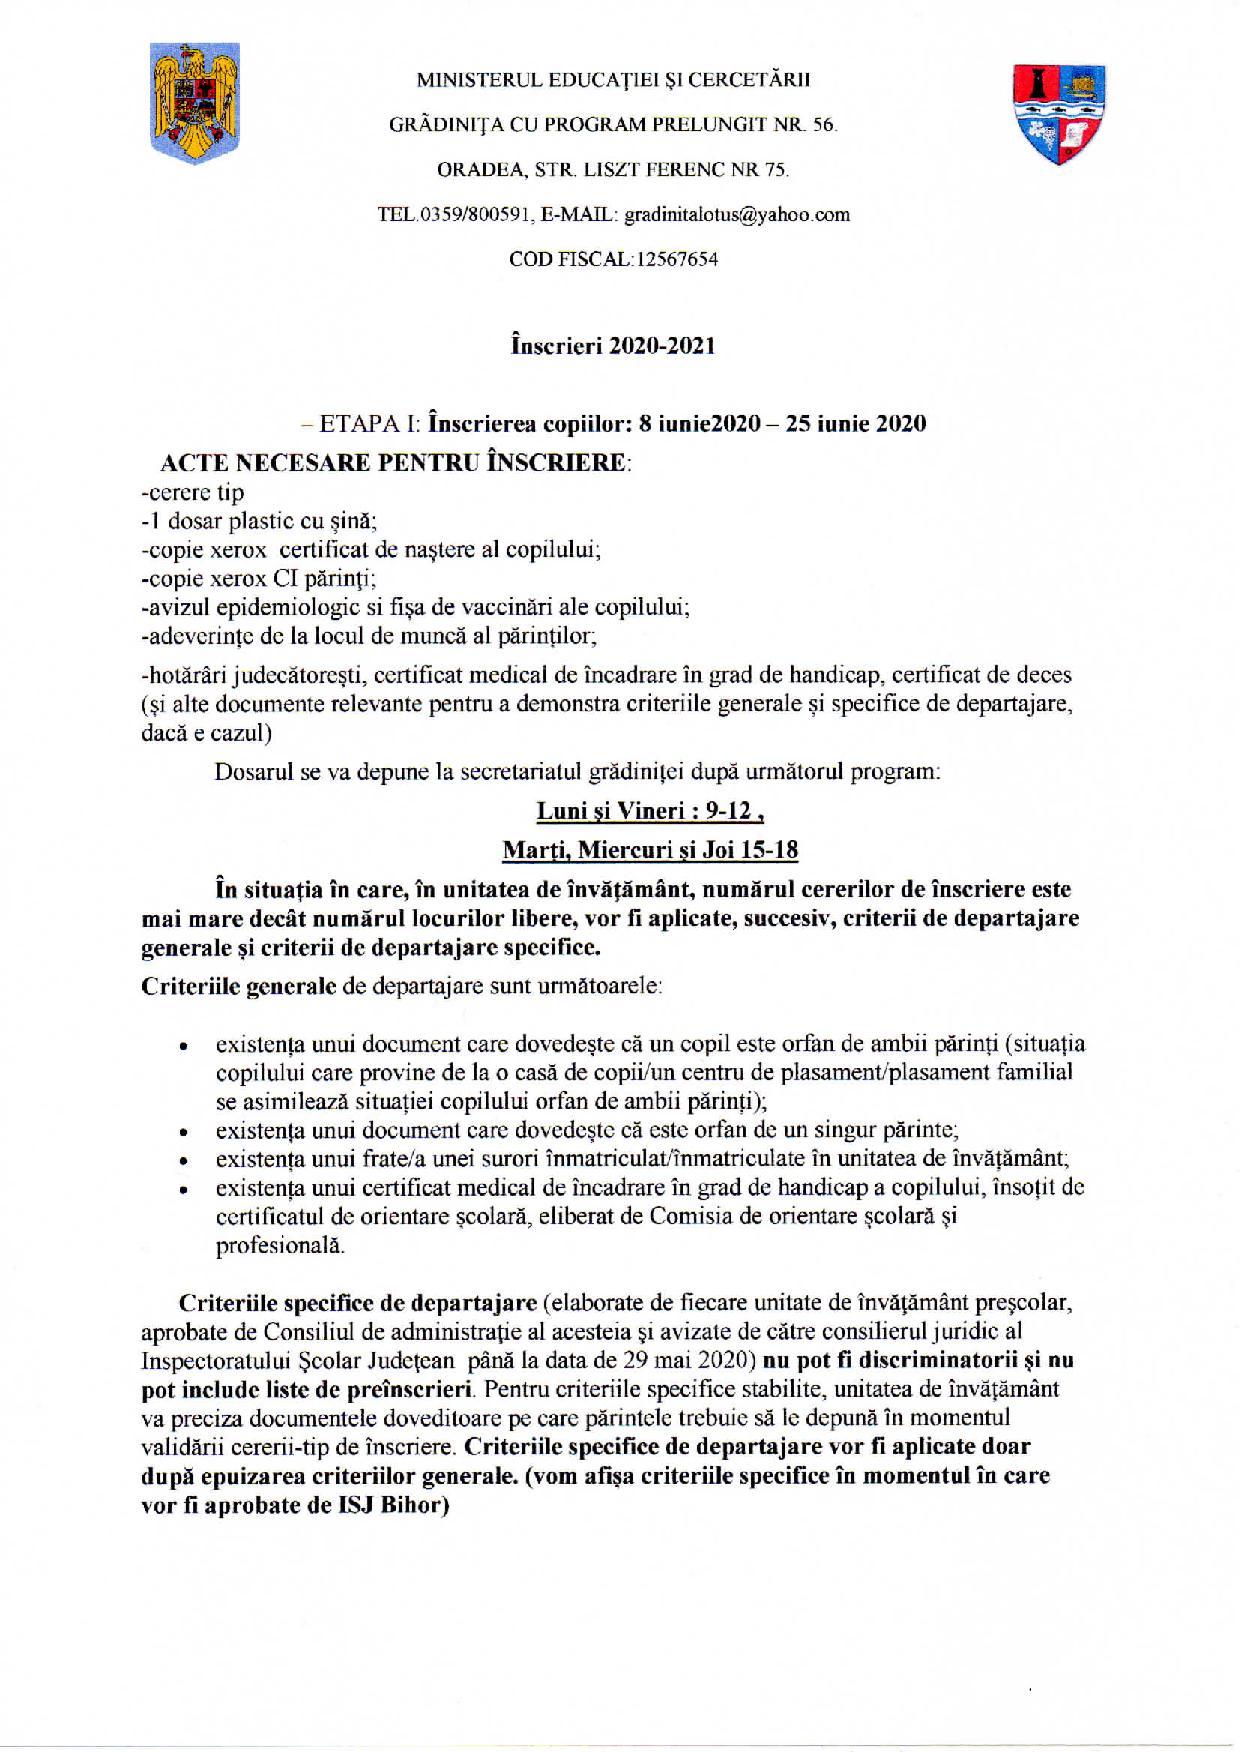 inscrieri 2020-2021-page-001